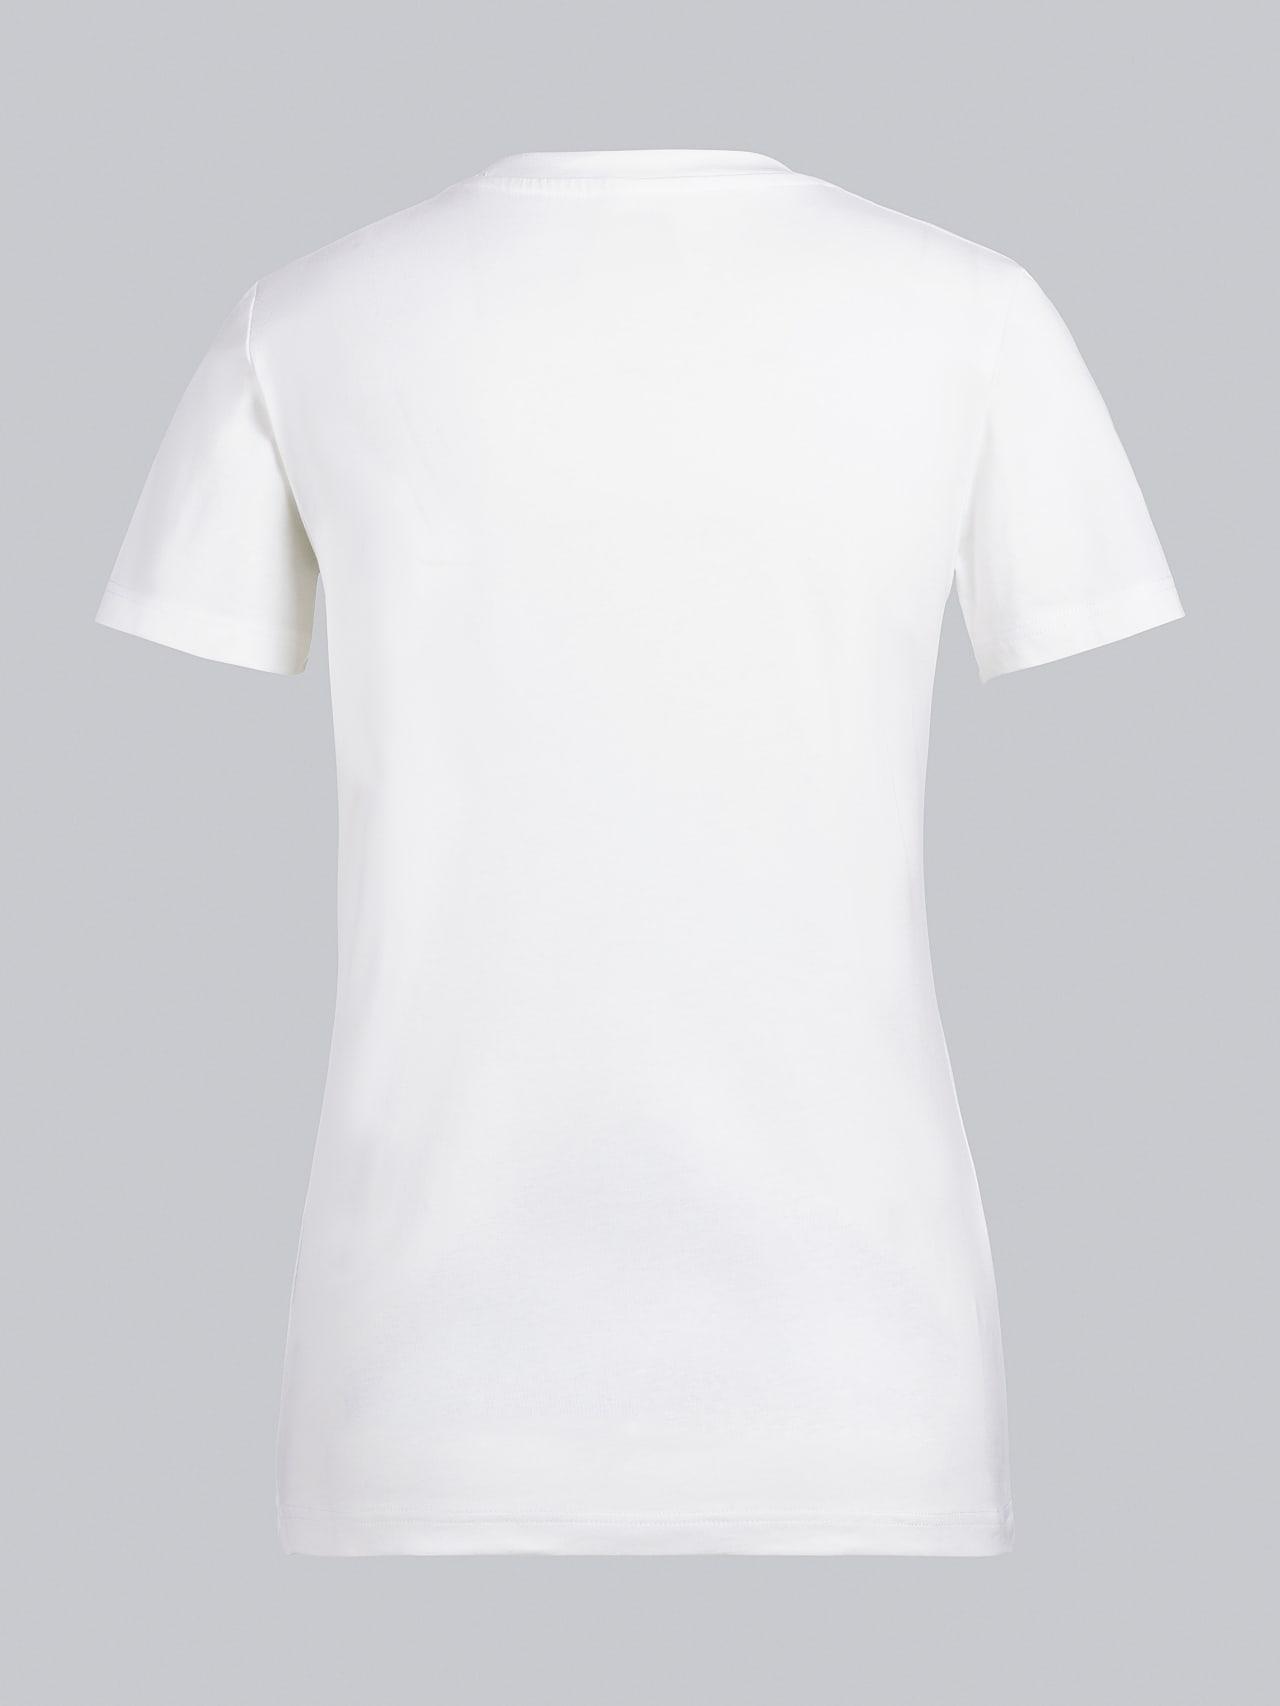 JANPA V1.Y5.02 Logo Print T-Shirt offwhite Left Alpha Tauri